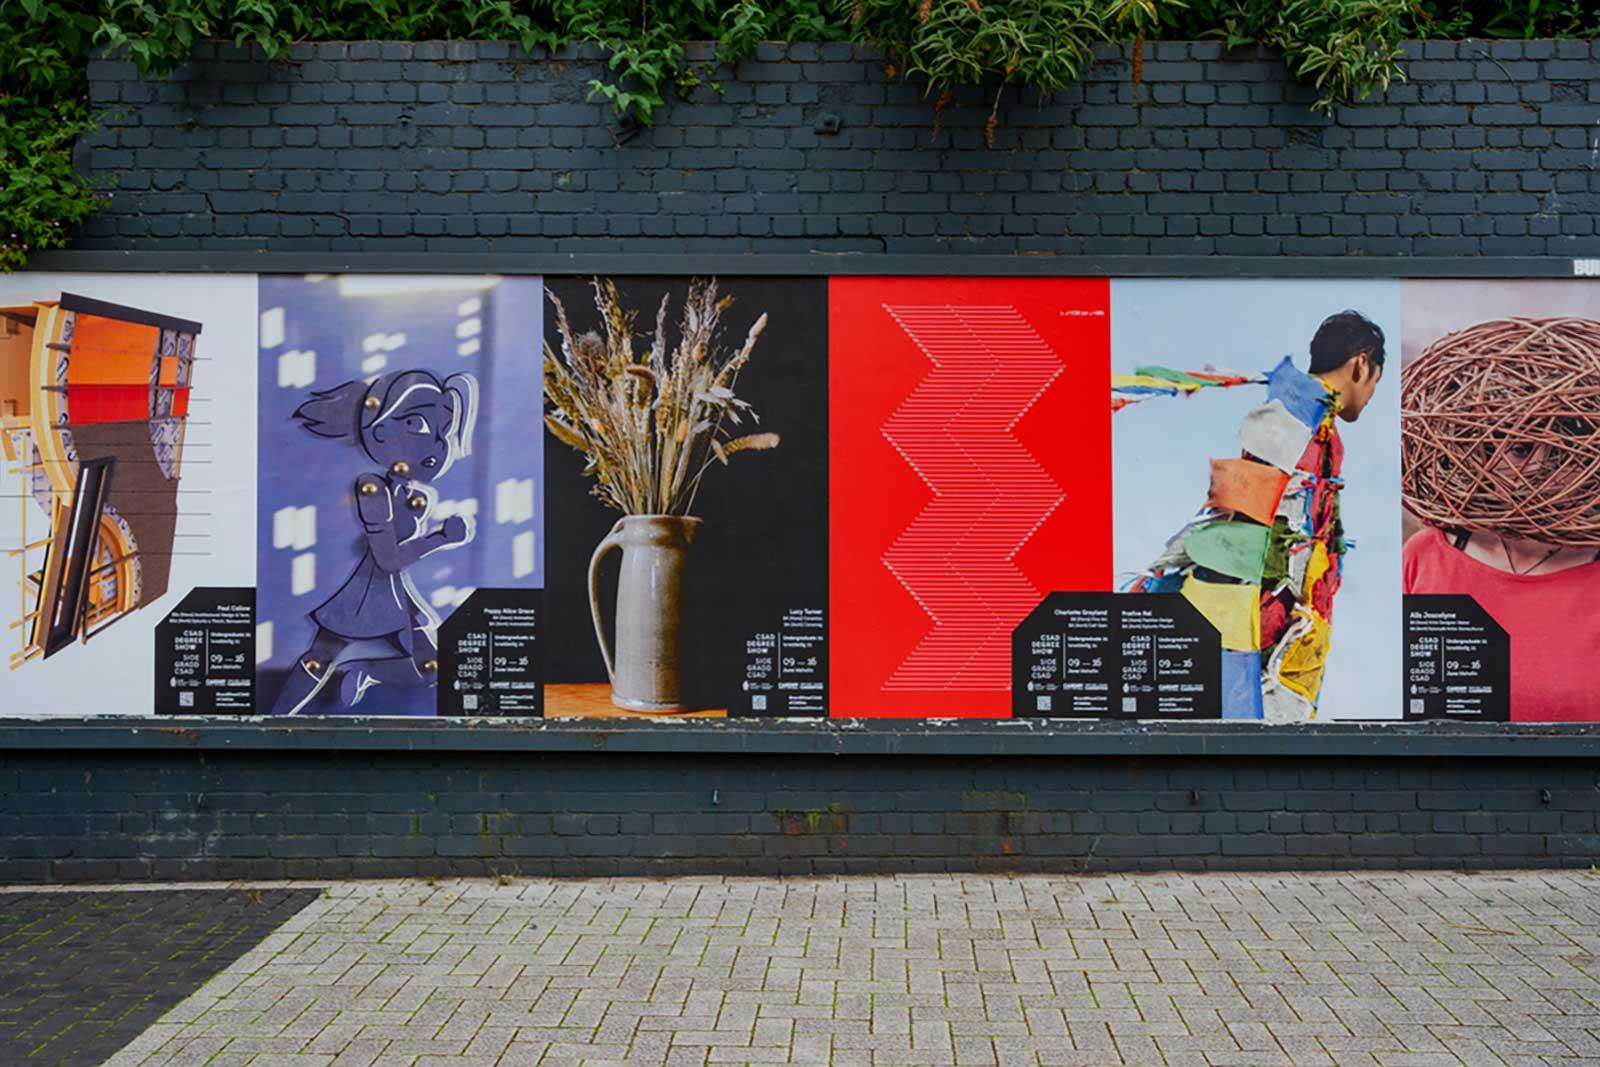 Cardiff School of Art and Design: Summer Showcase